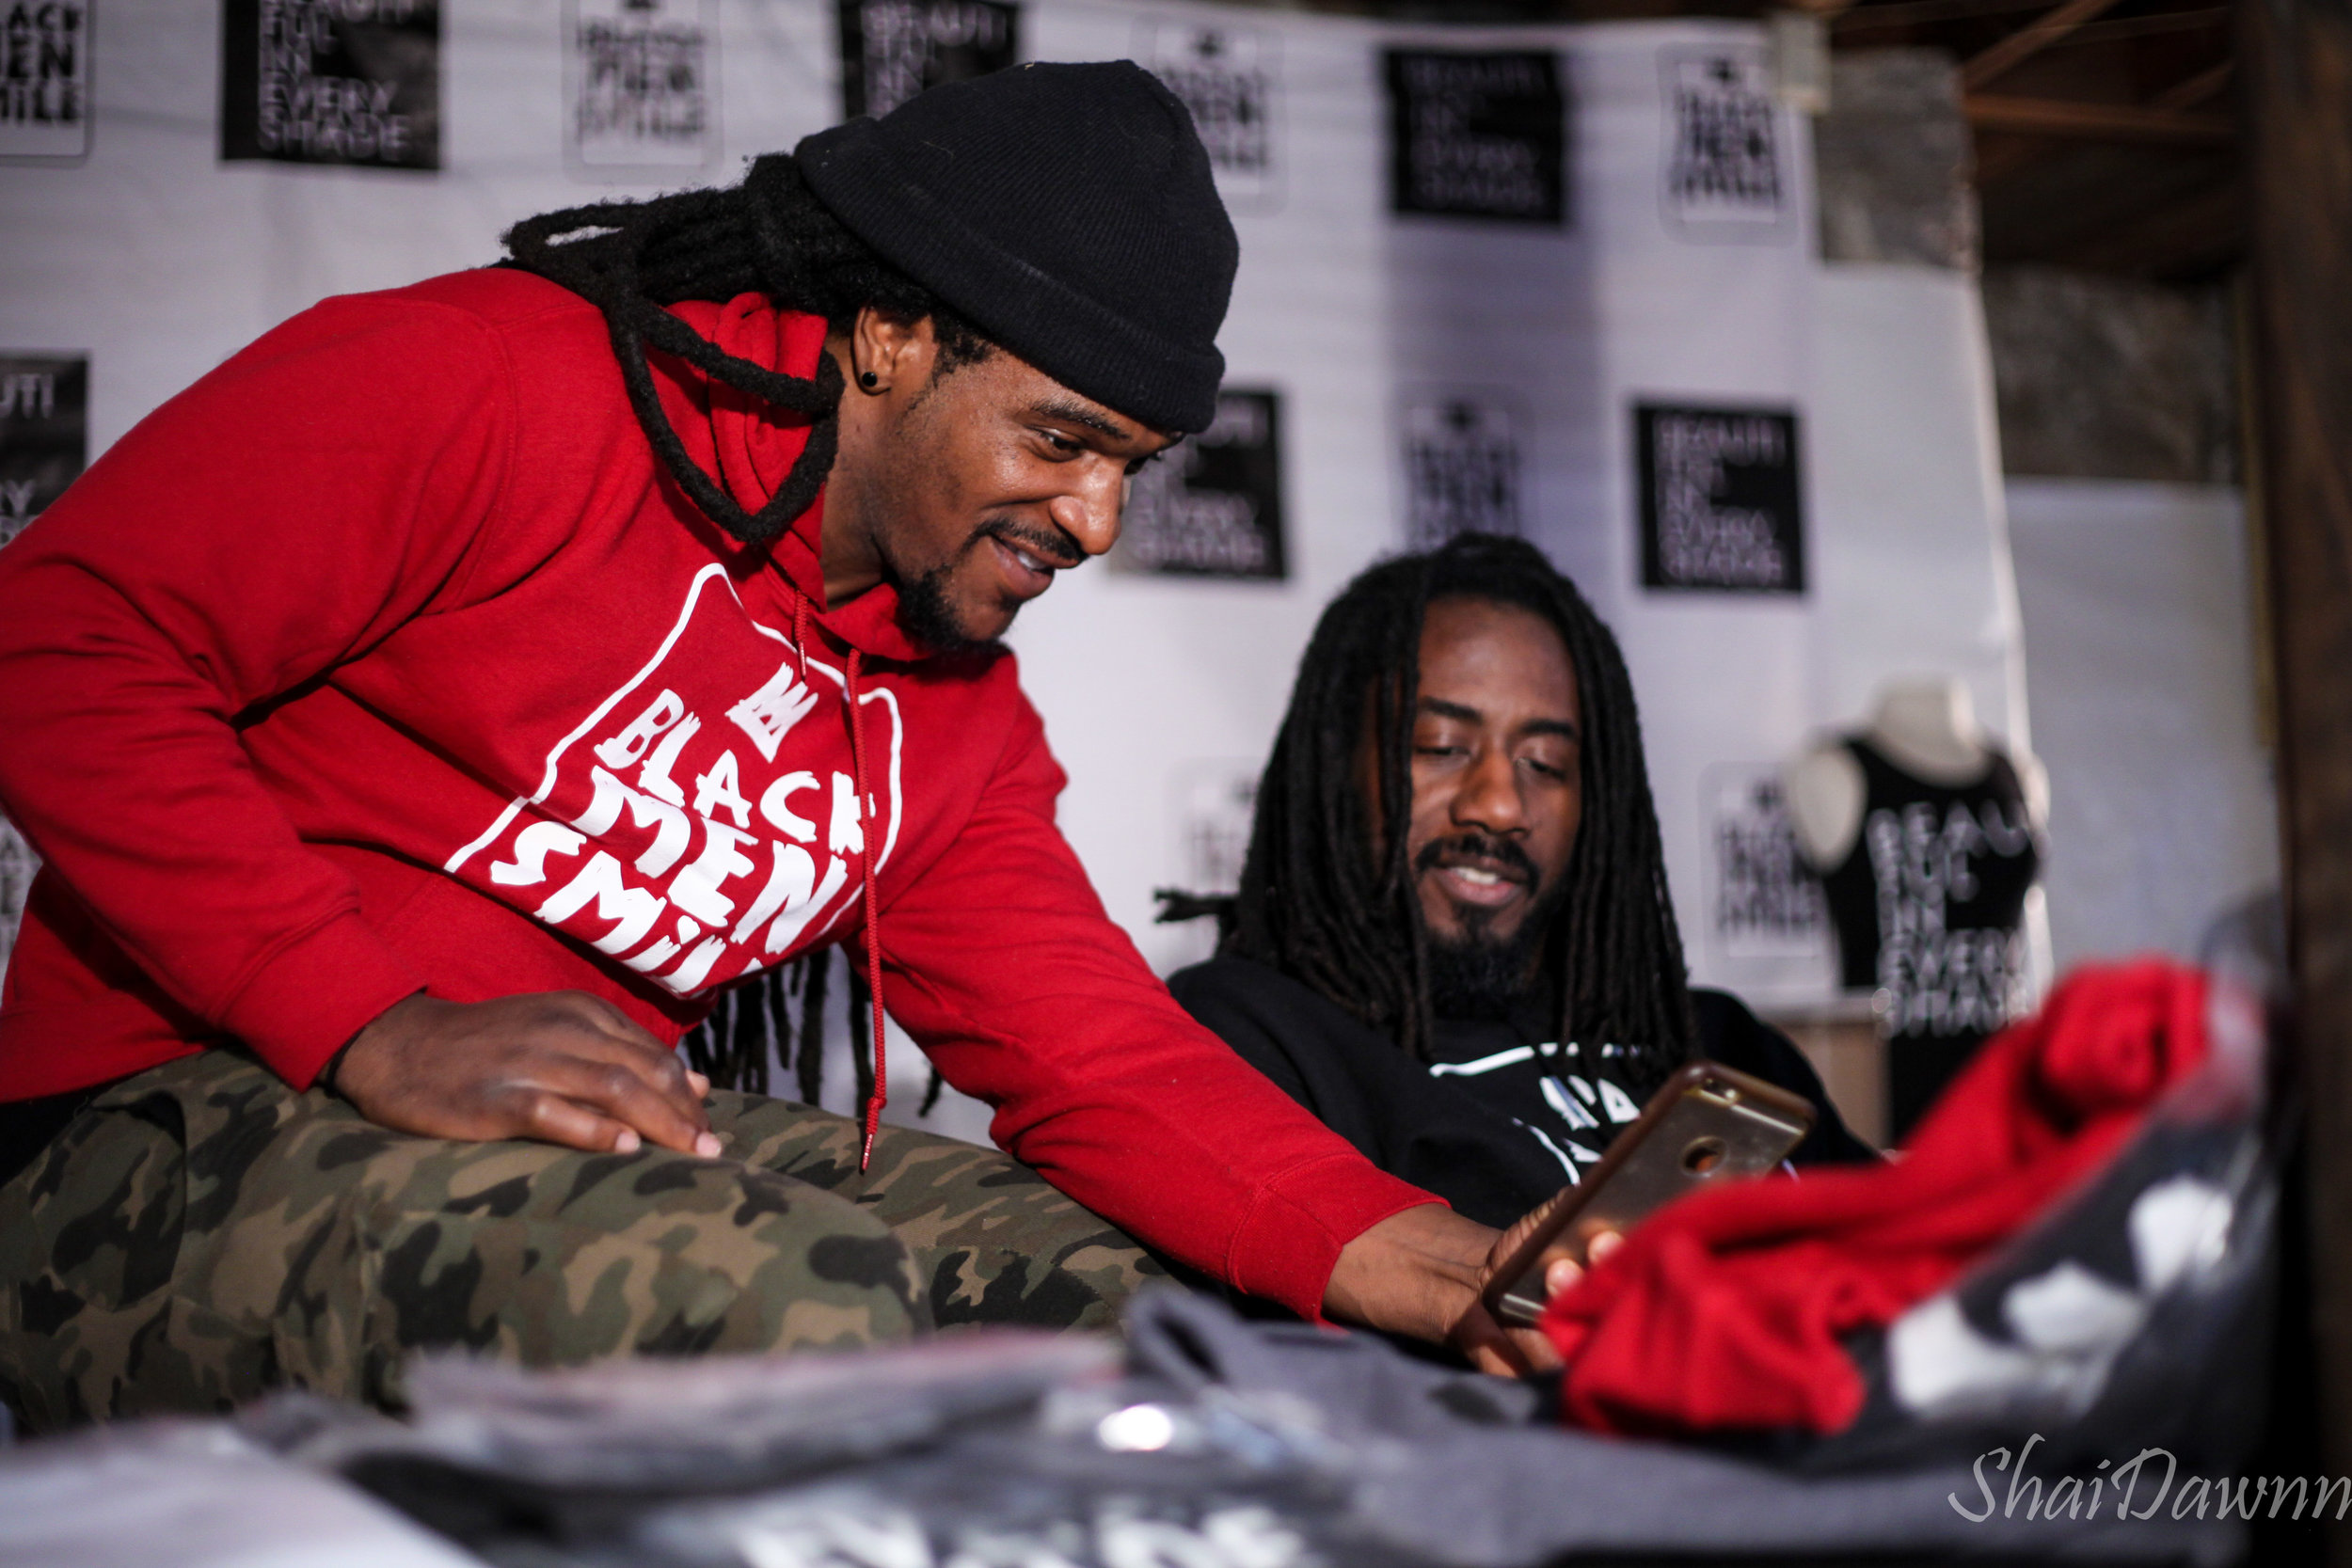 Black Men Smile® Co-Directors Devan Dunson and Carlton Mackey at Headquarters in Atlanta, GA